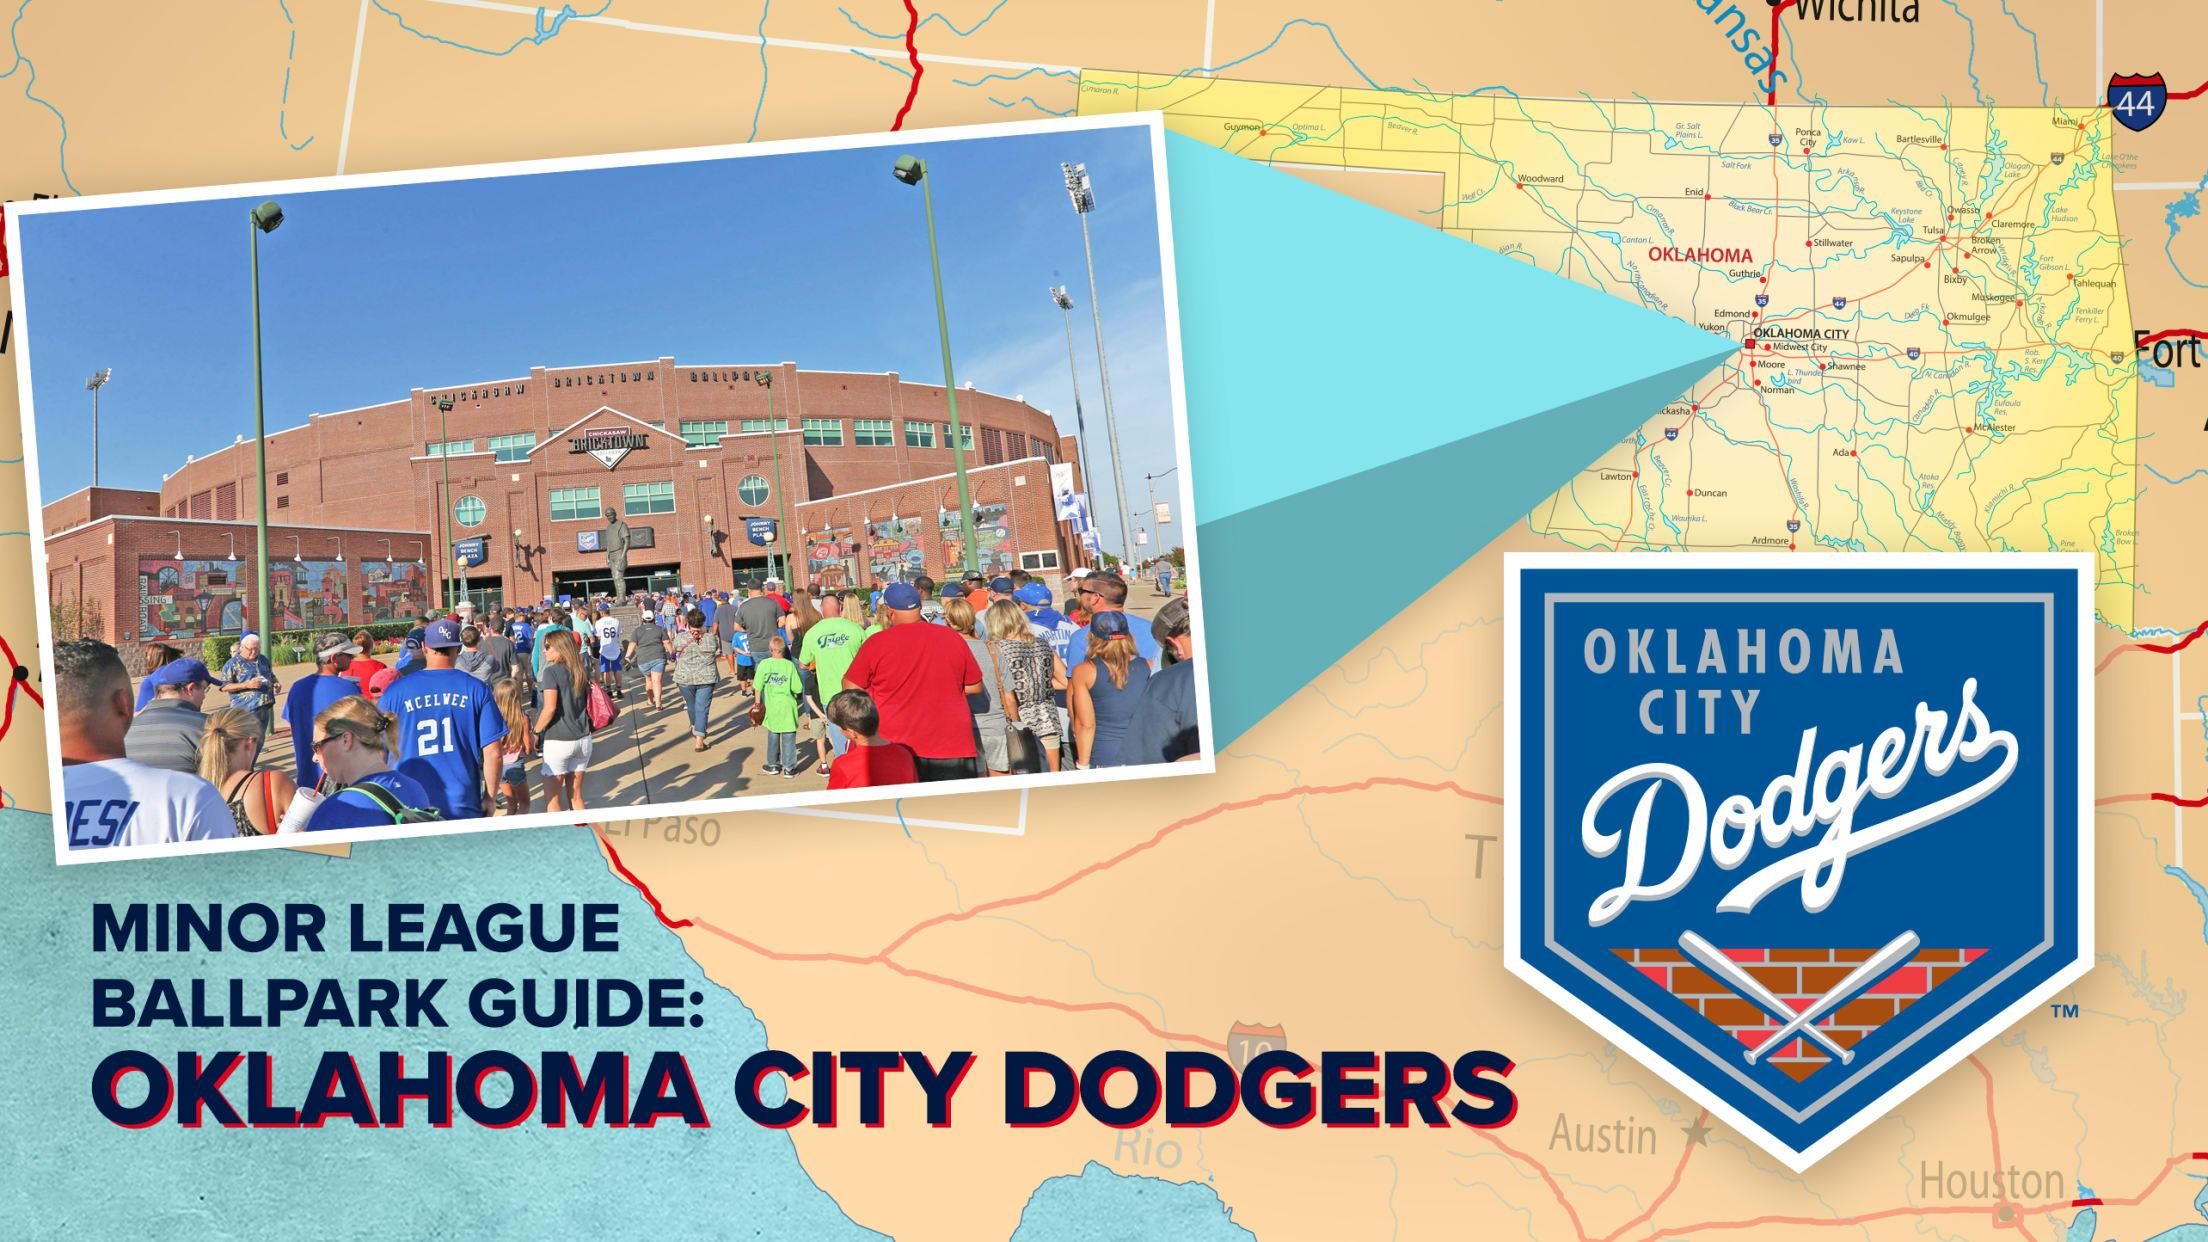 2568x1445-Stadium_Map_Oklahoma_City